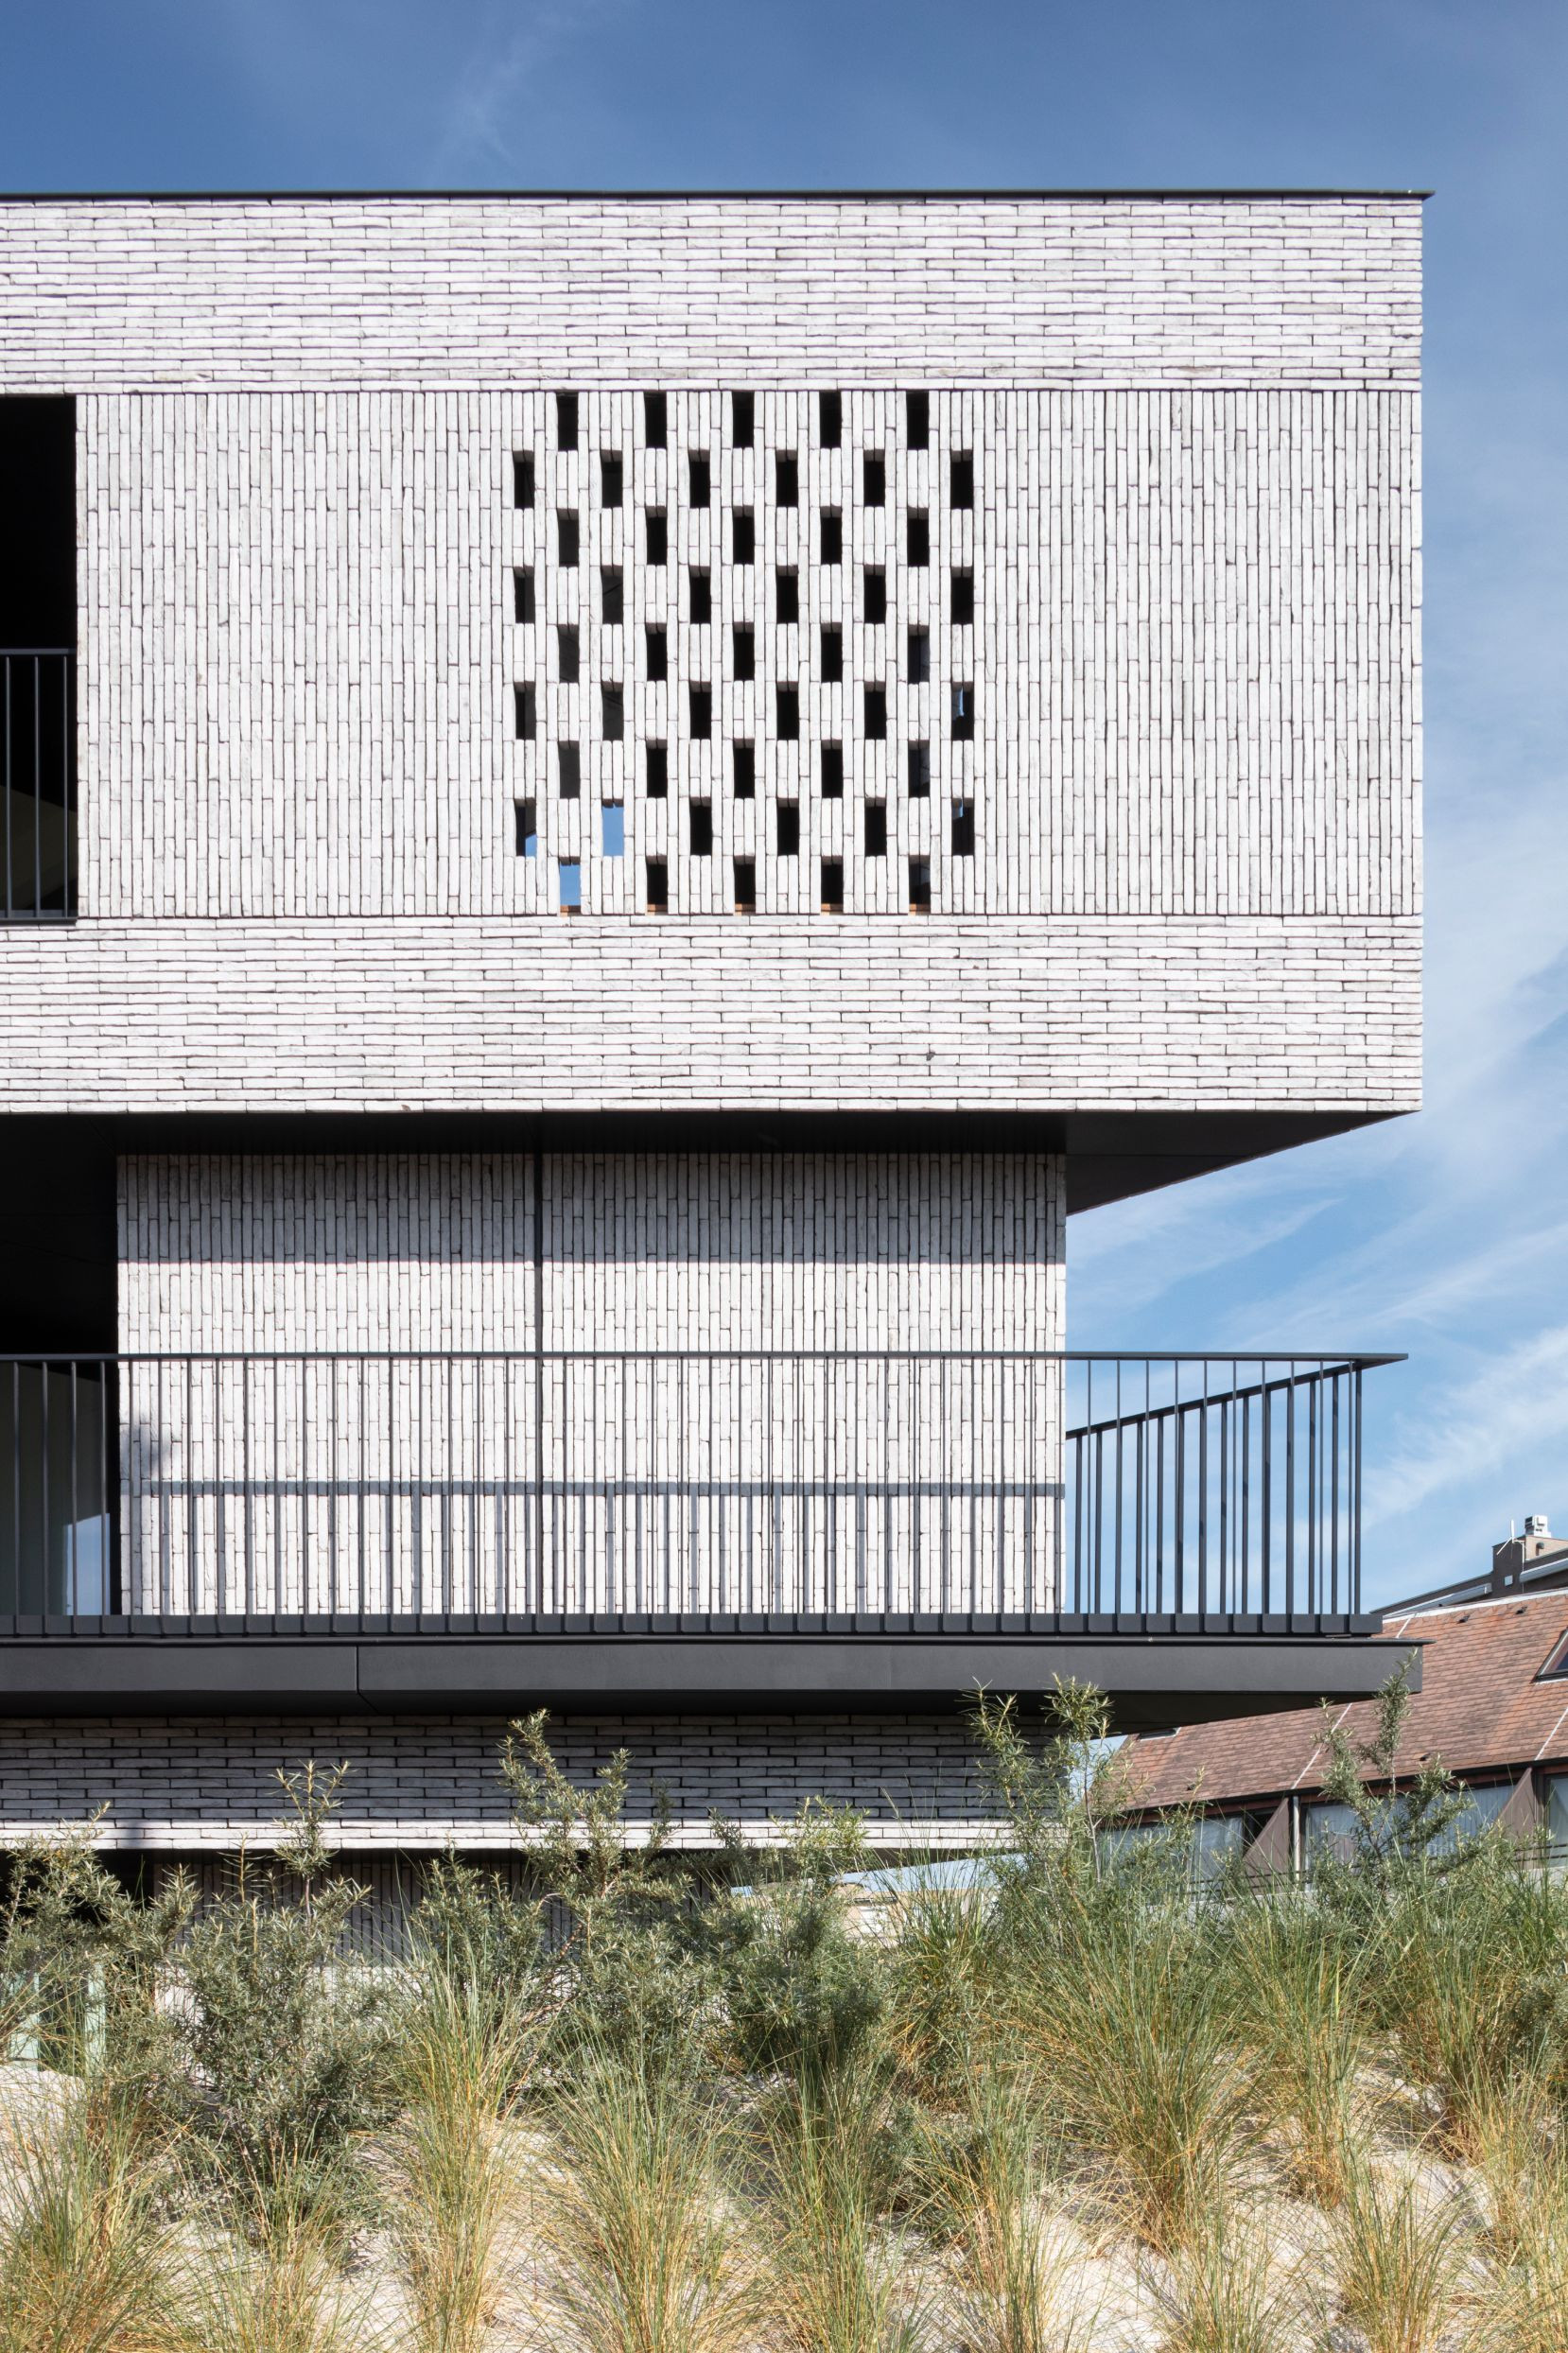 Pierre Paulin - Rietveldprojects - Sint-Idesbald - Tvdv9.jpg